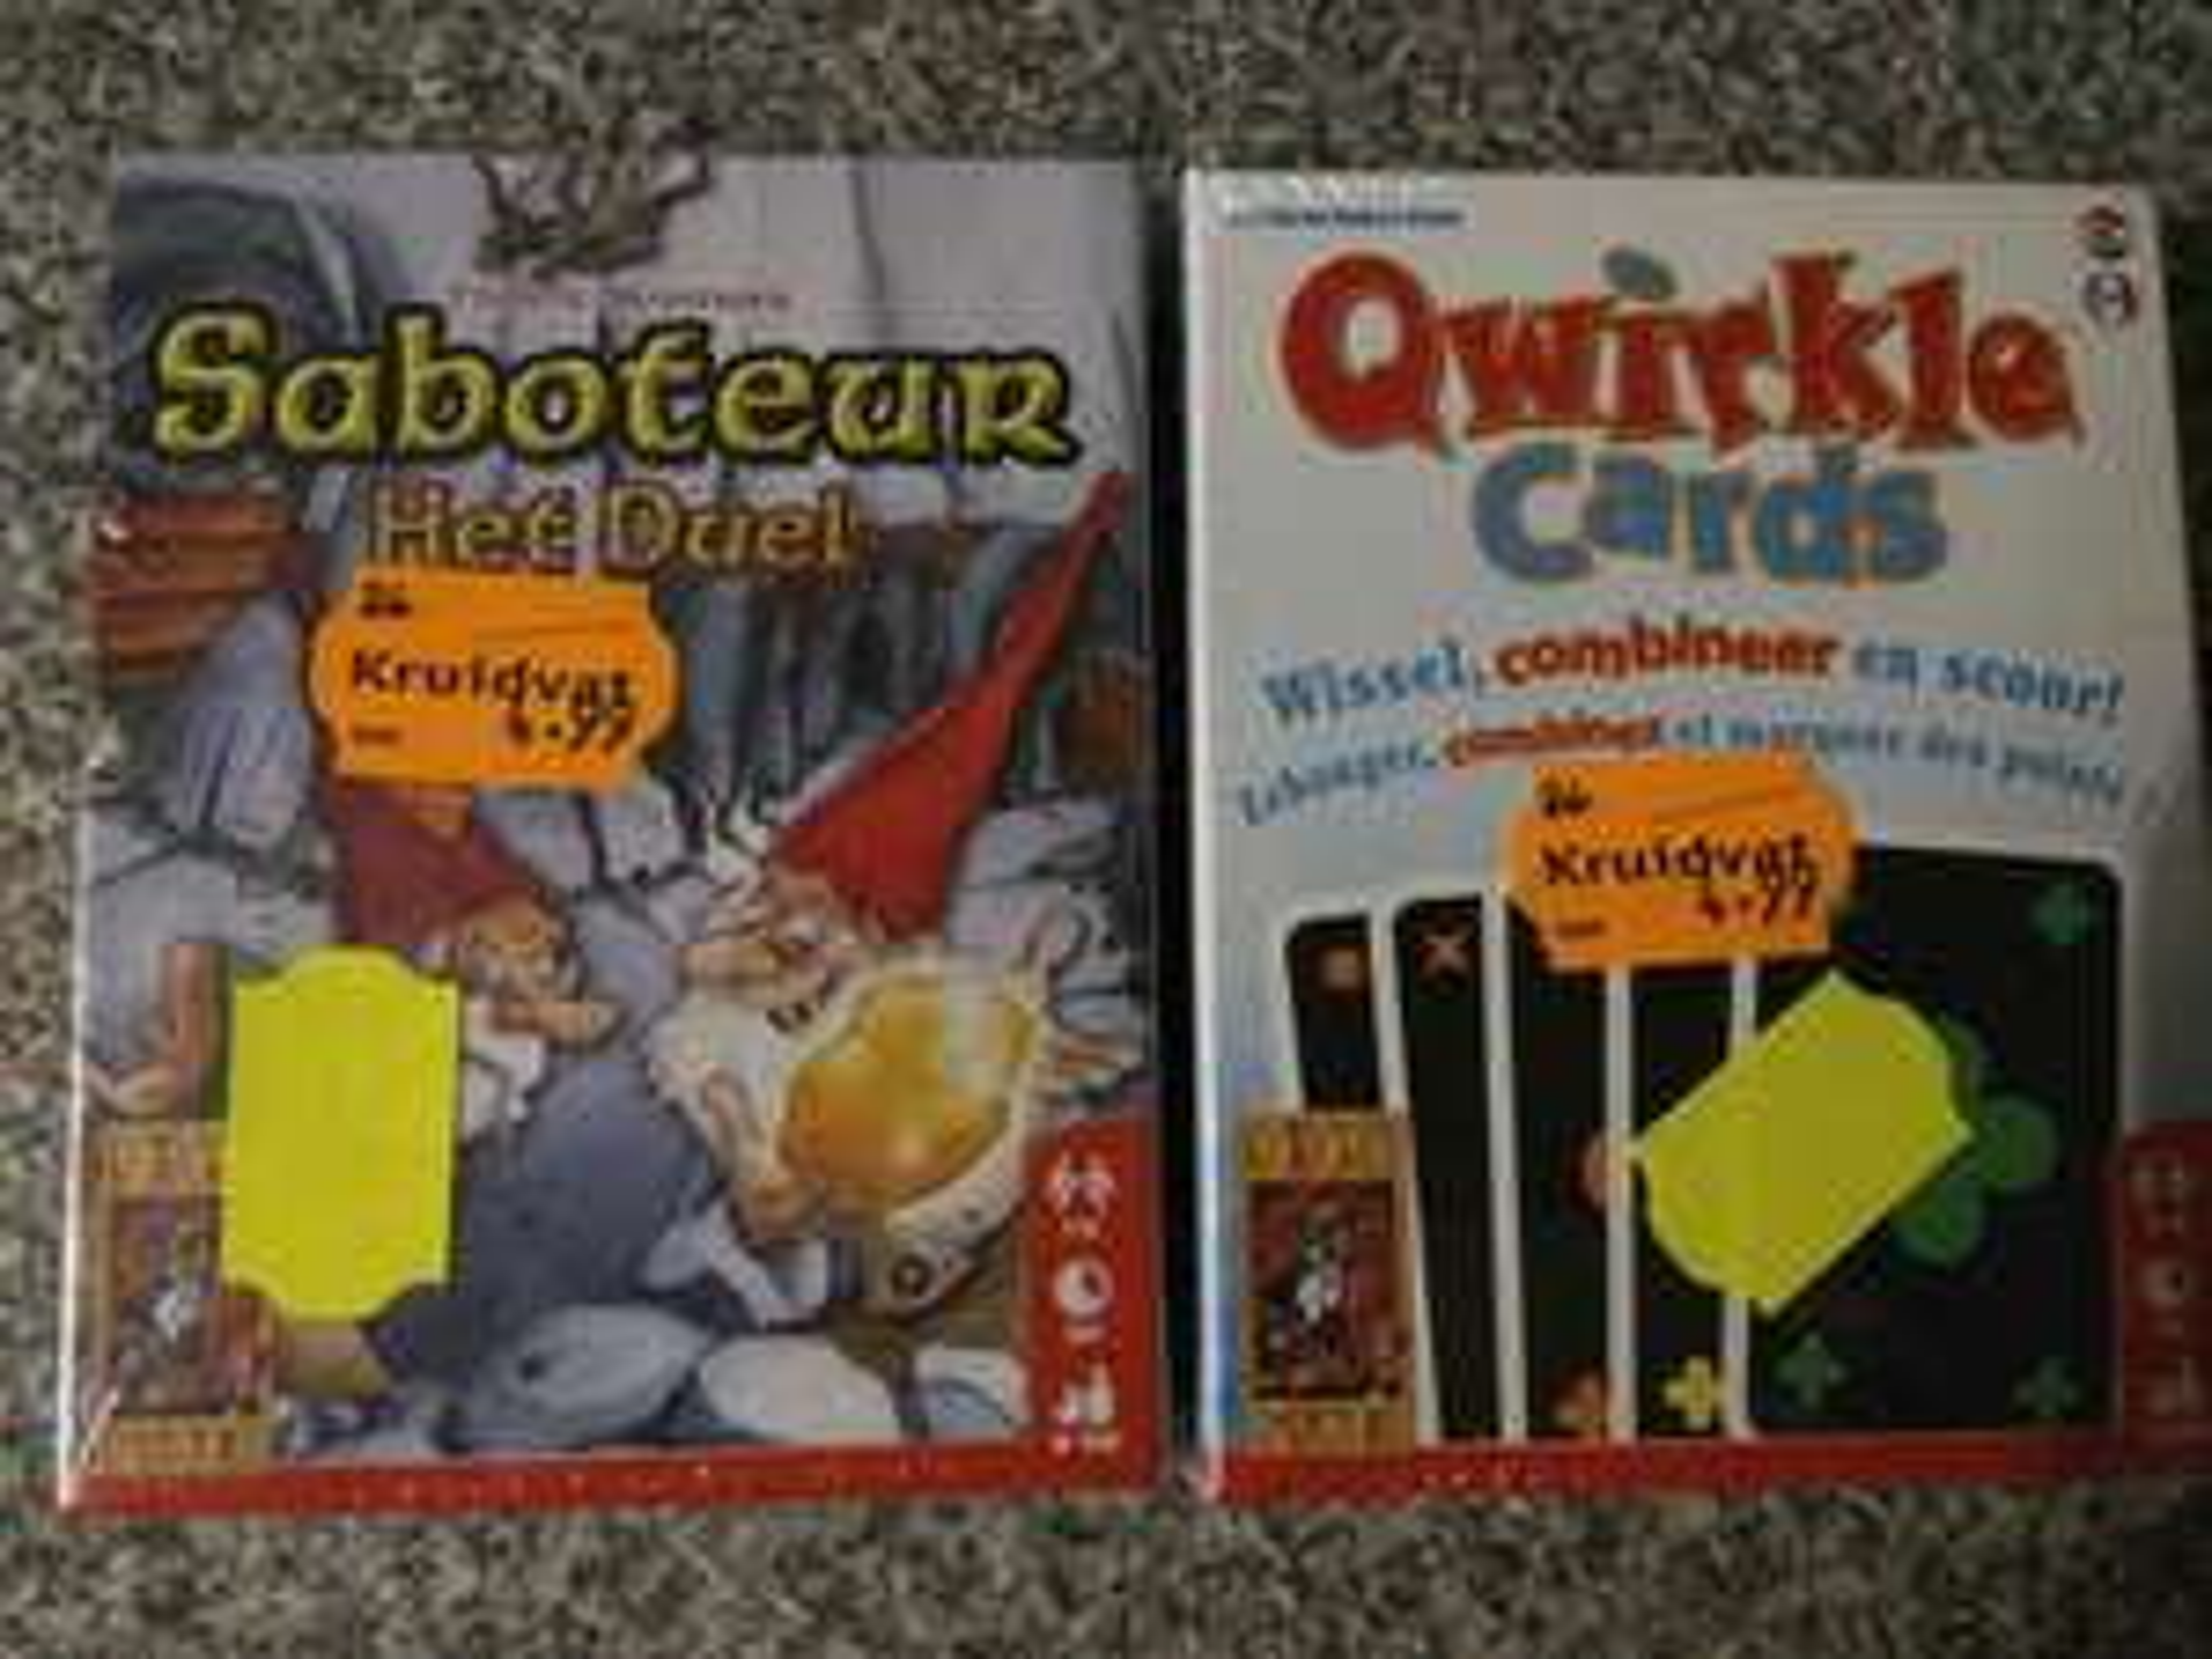 [Lokaal?] Qwirkle Cards en Saboteur, Het Duel €2,50 @Kruidvat